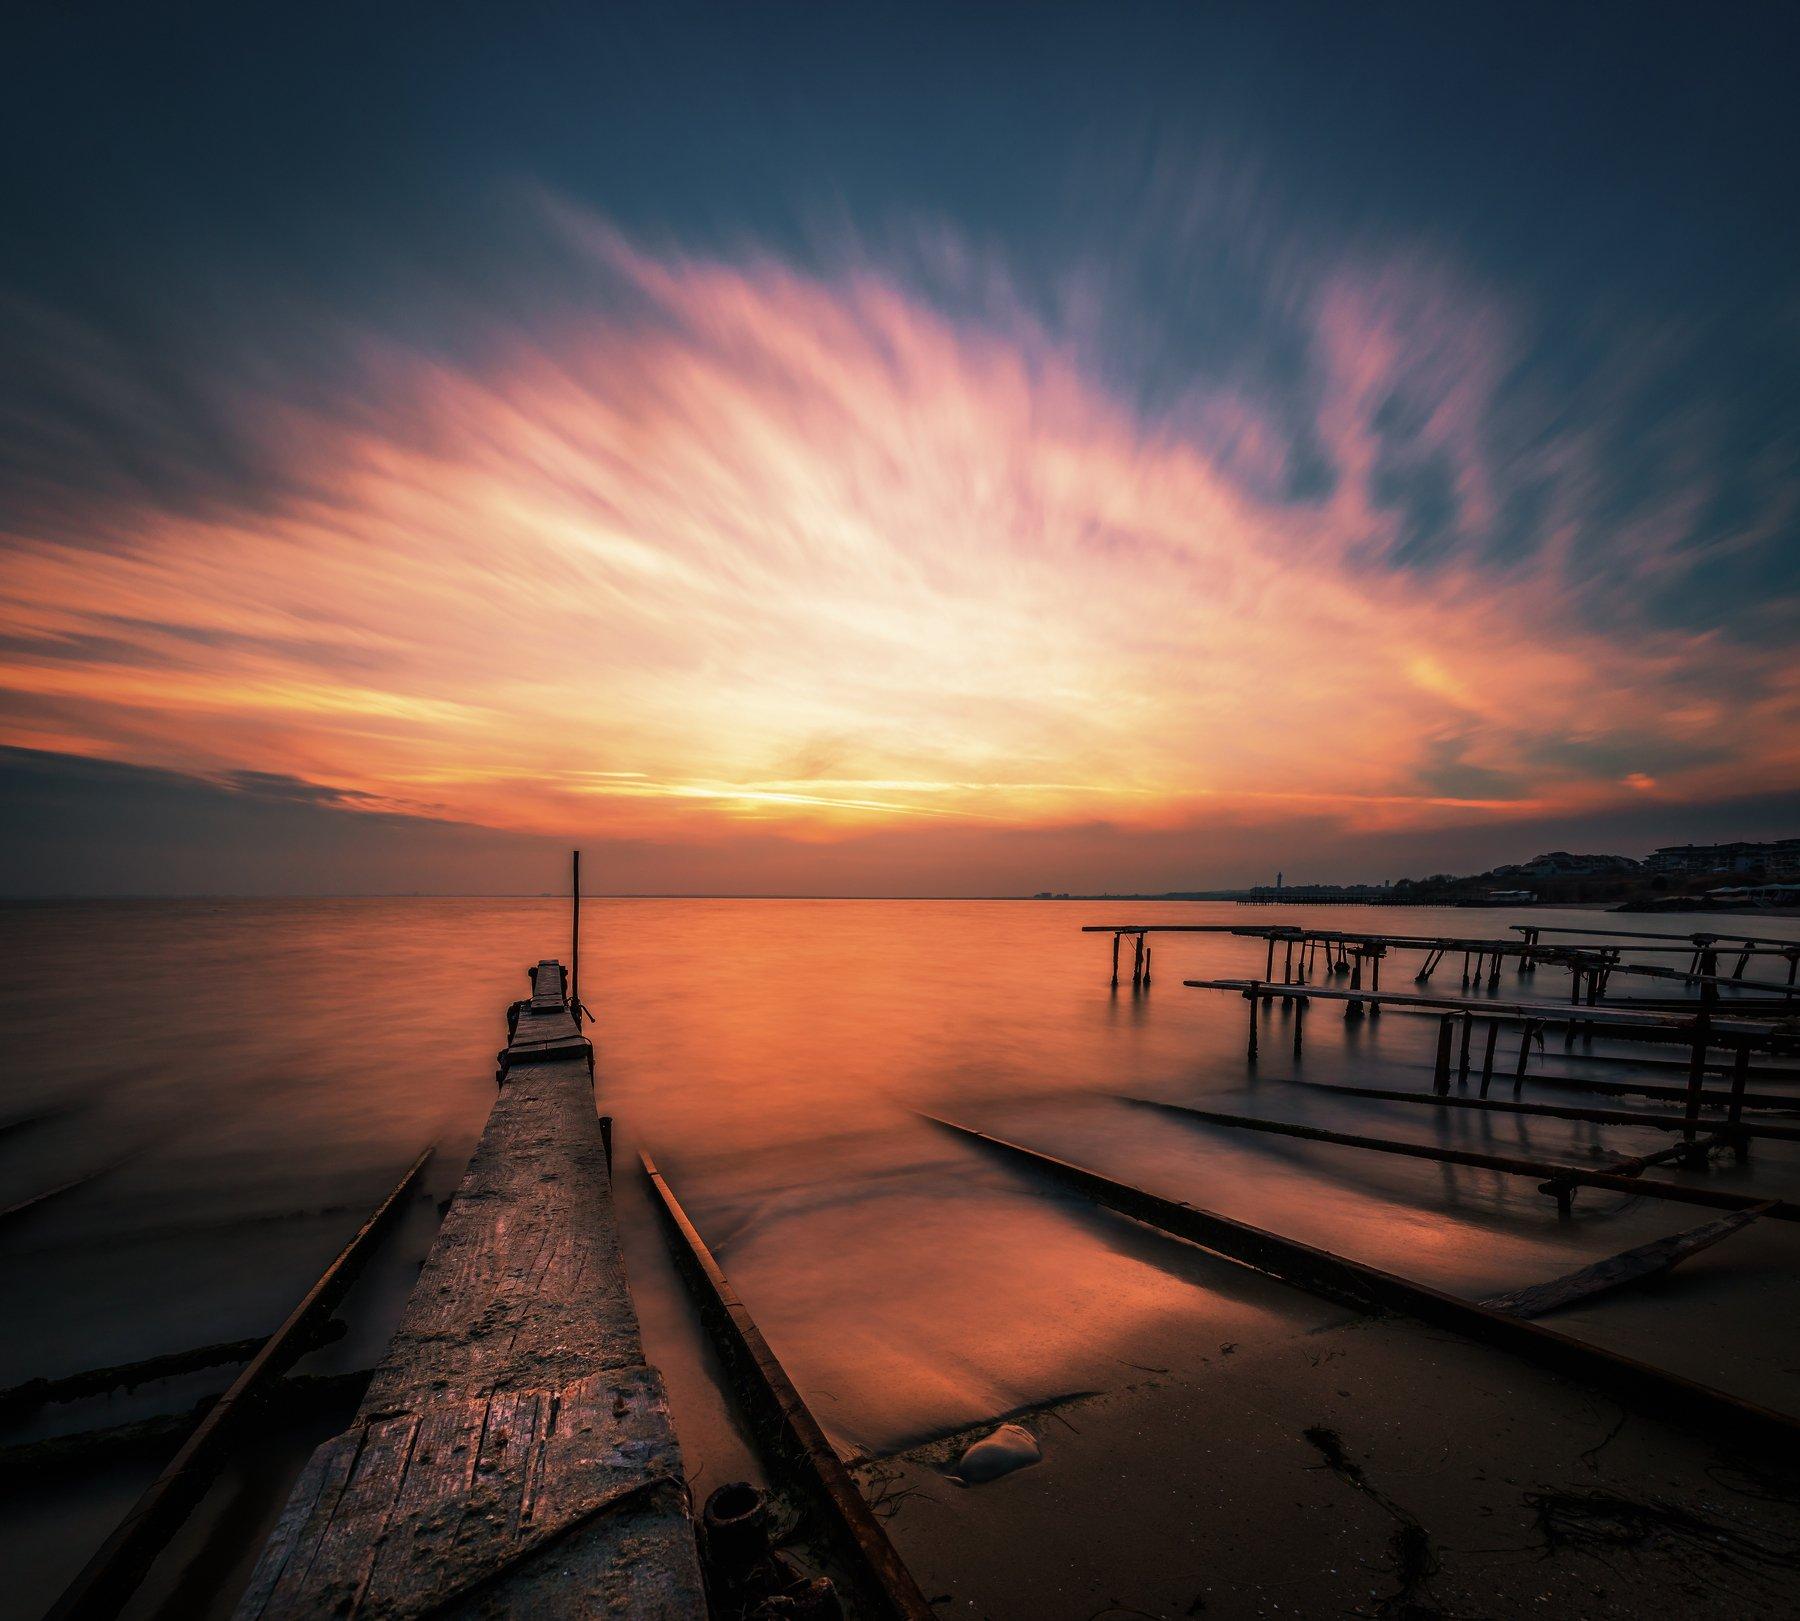 sunset, nature, sea, water, landscape, pier, clouds, long exposure, Jeni Madjarova